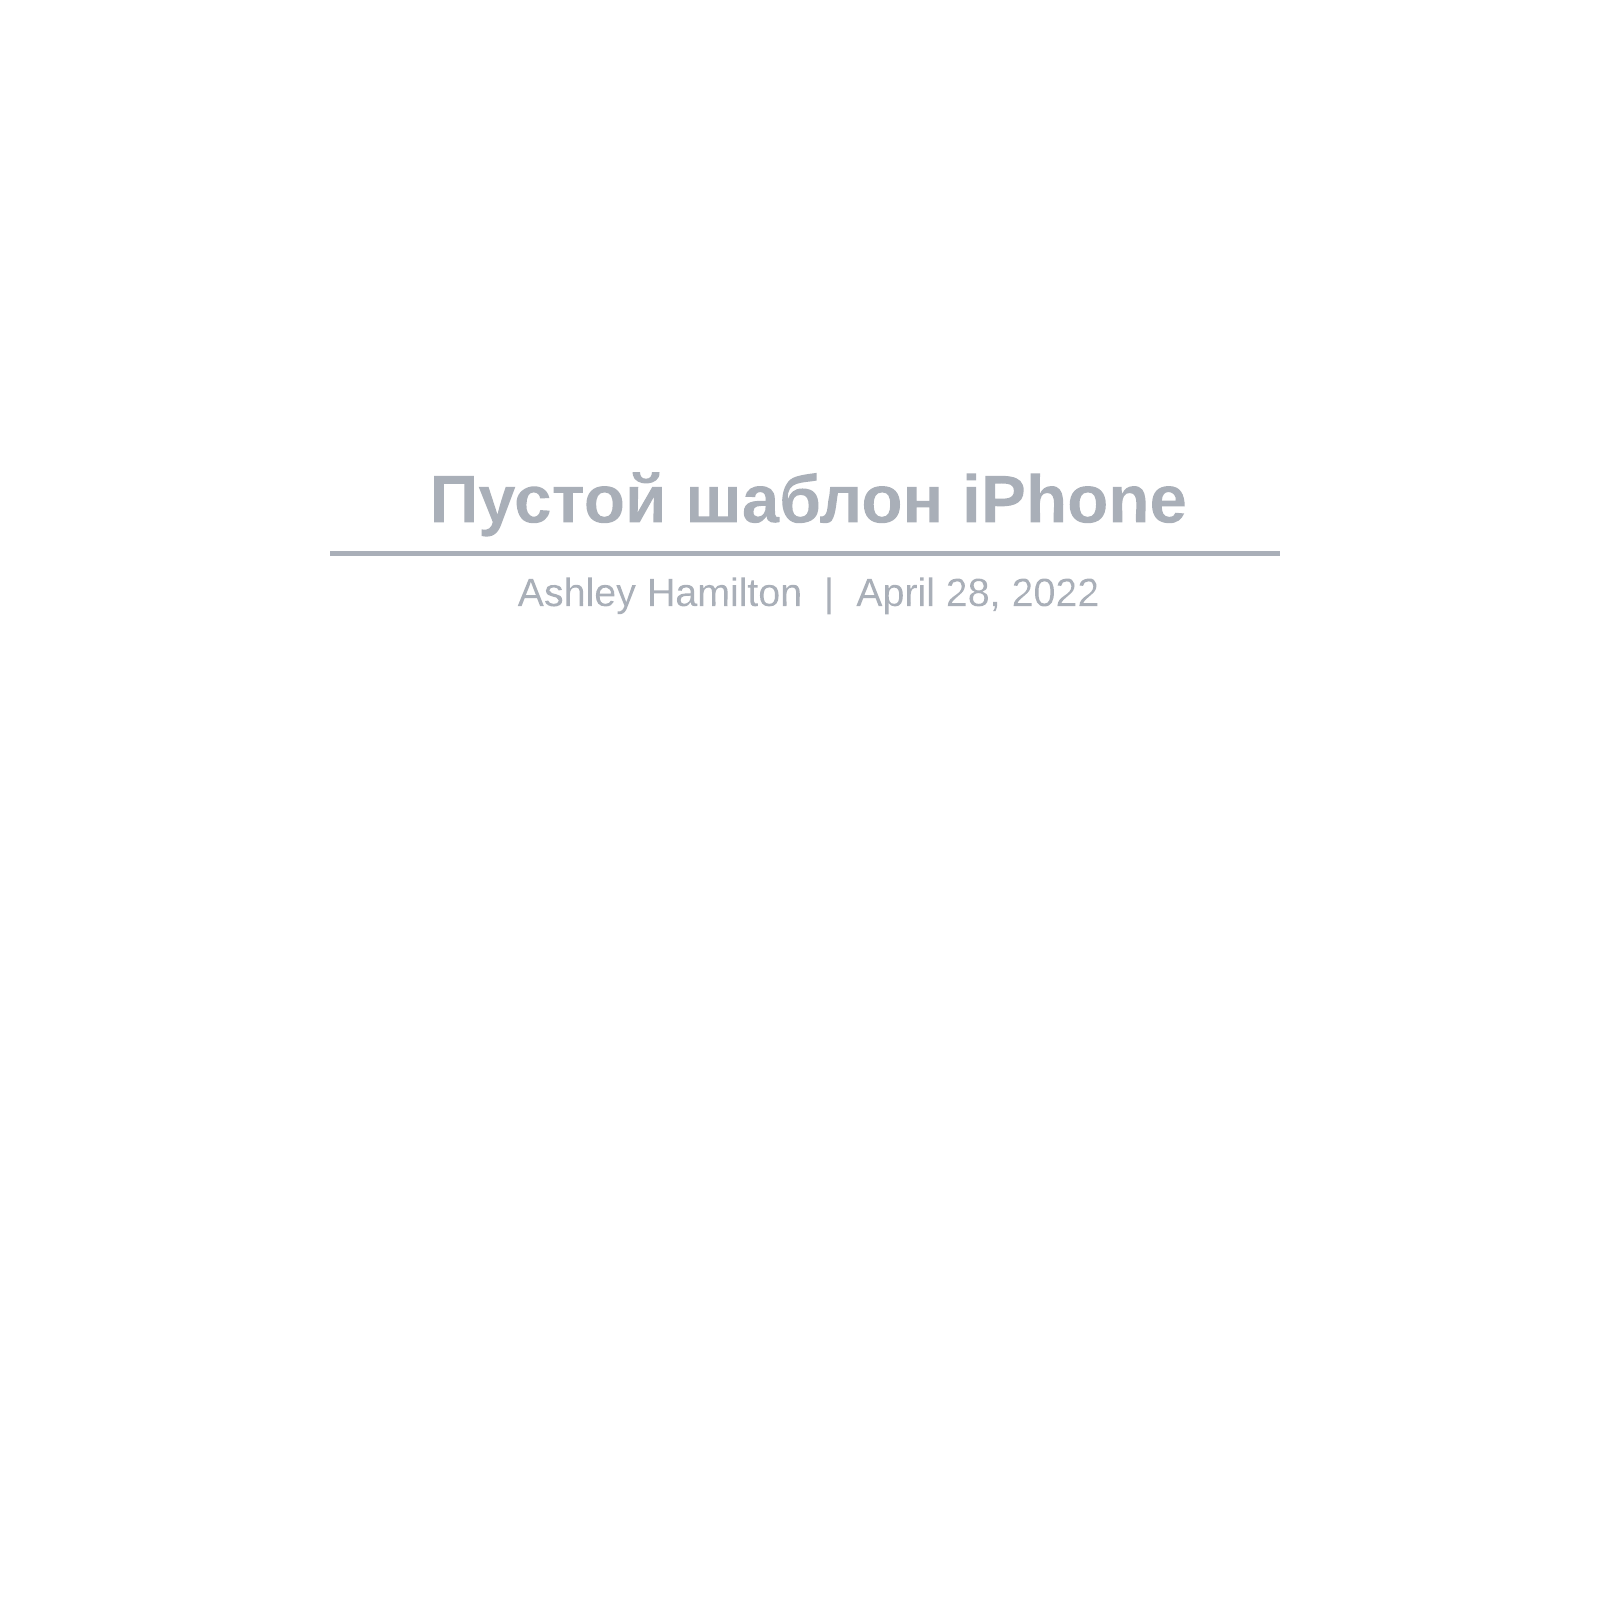 Пустой шаблон iPhone